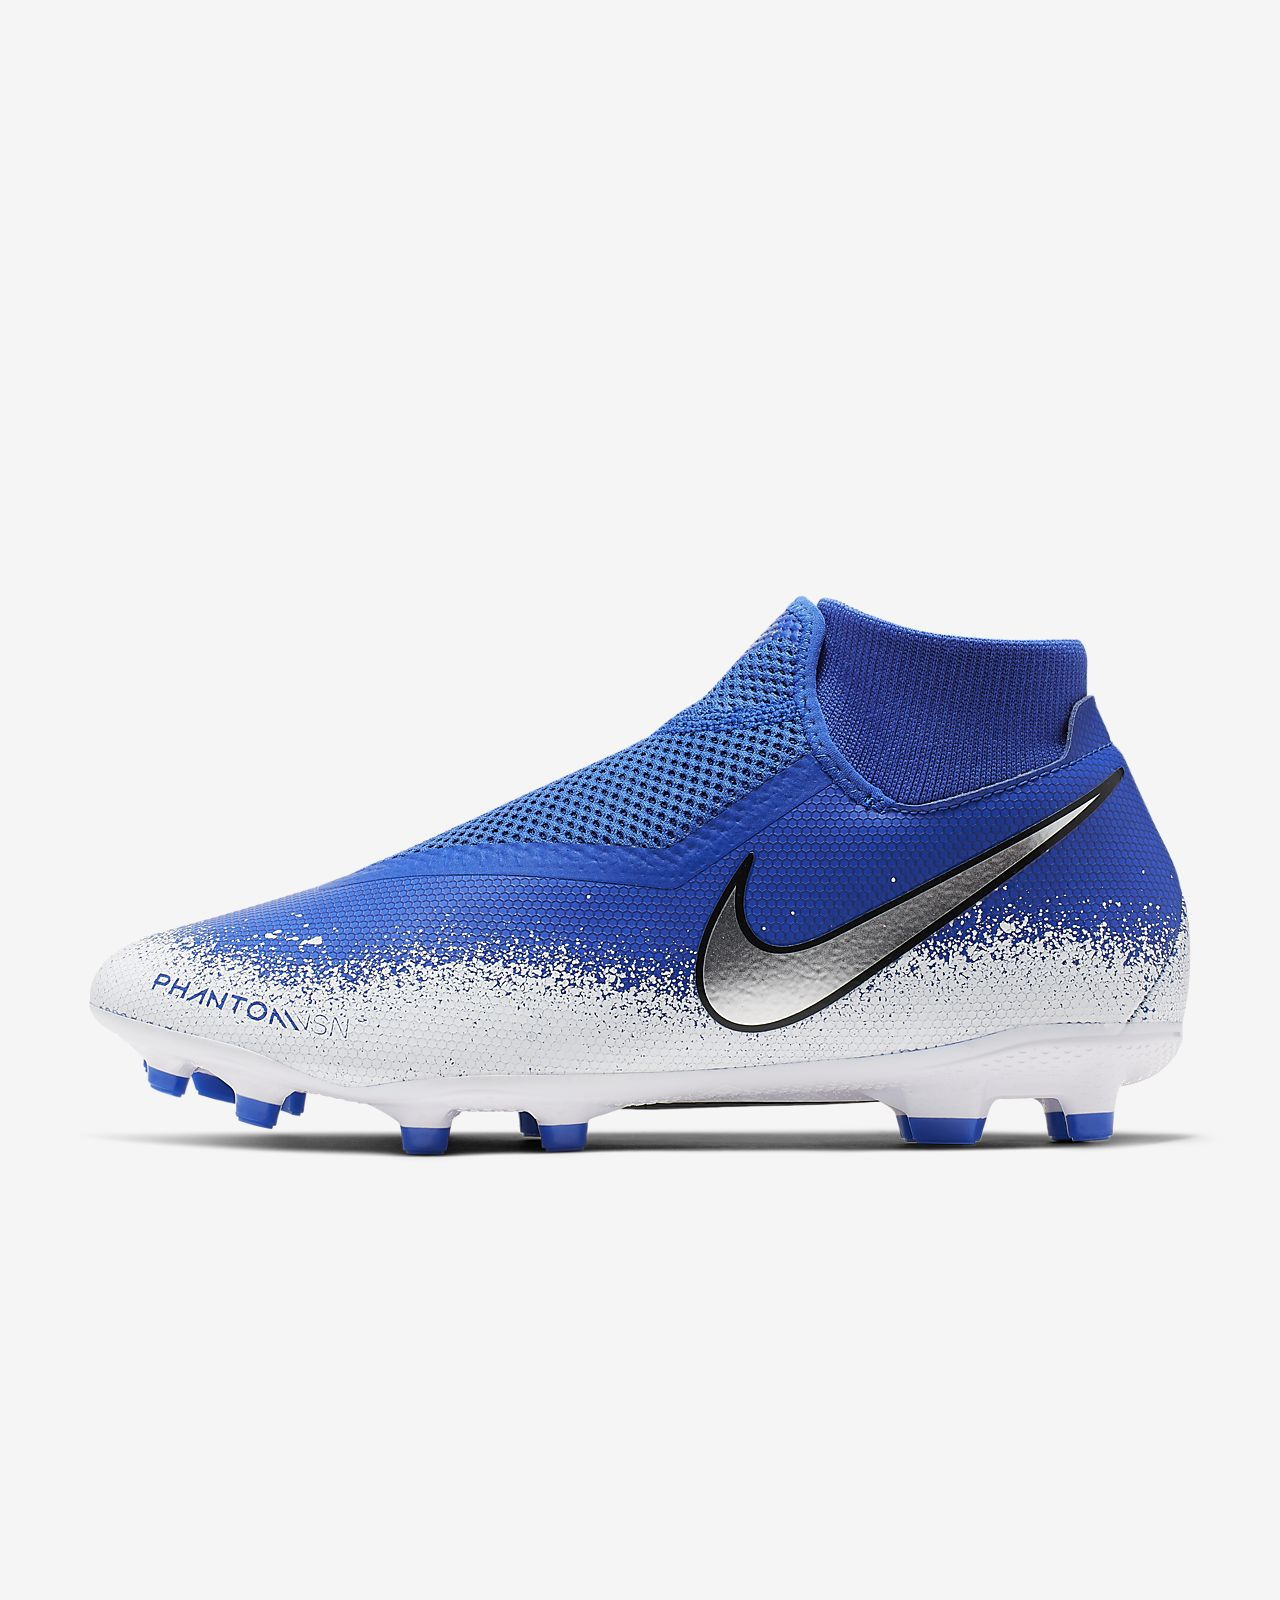 new style 7ceea 9edd7 ... Nike Phantom Vision Academy Dynamic Fit MG-fodboldstøvle til flere  typer underlag